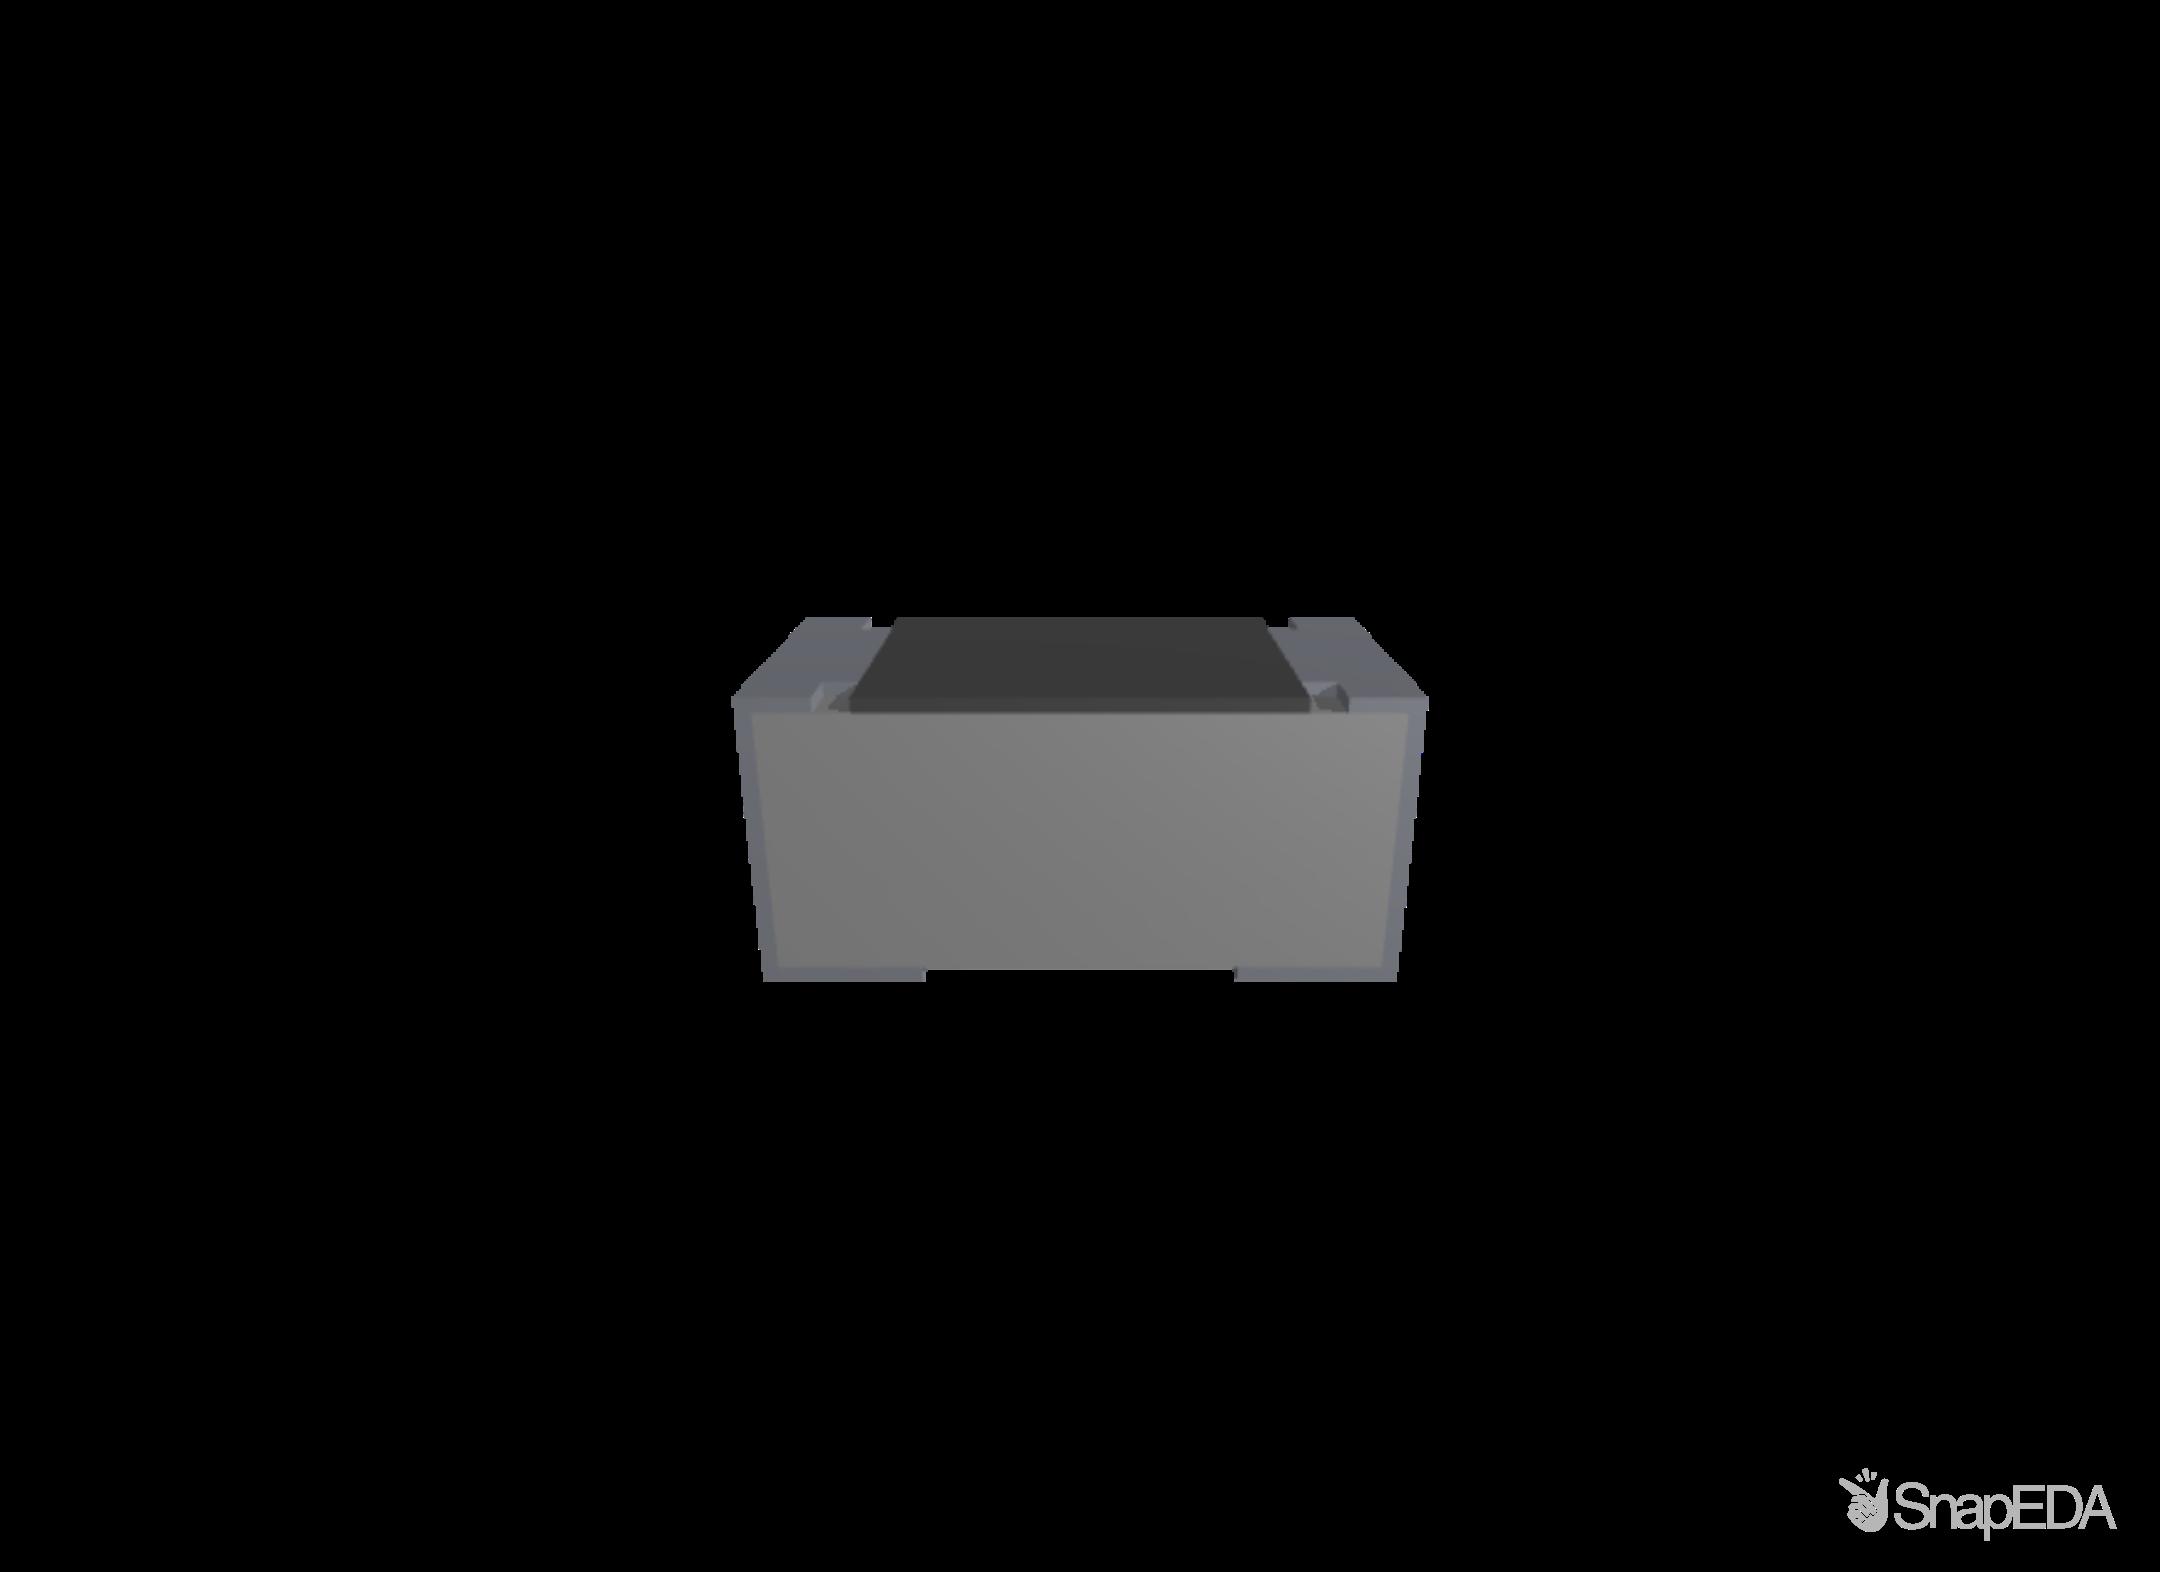 CRCW02014K70FKED 3D Model